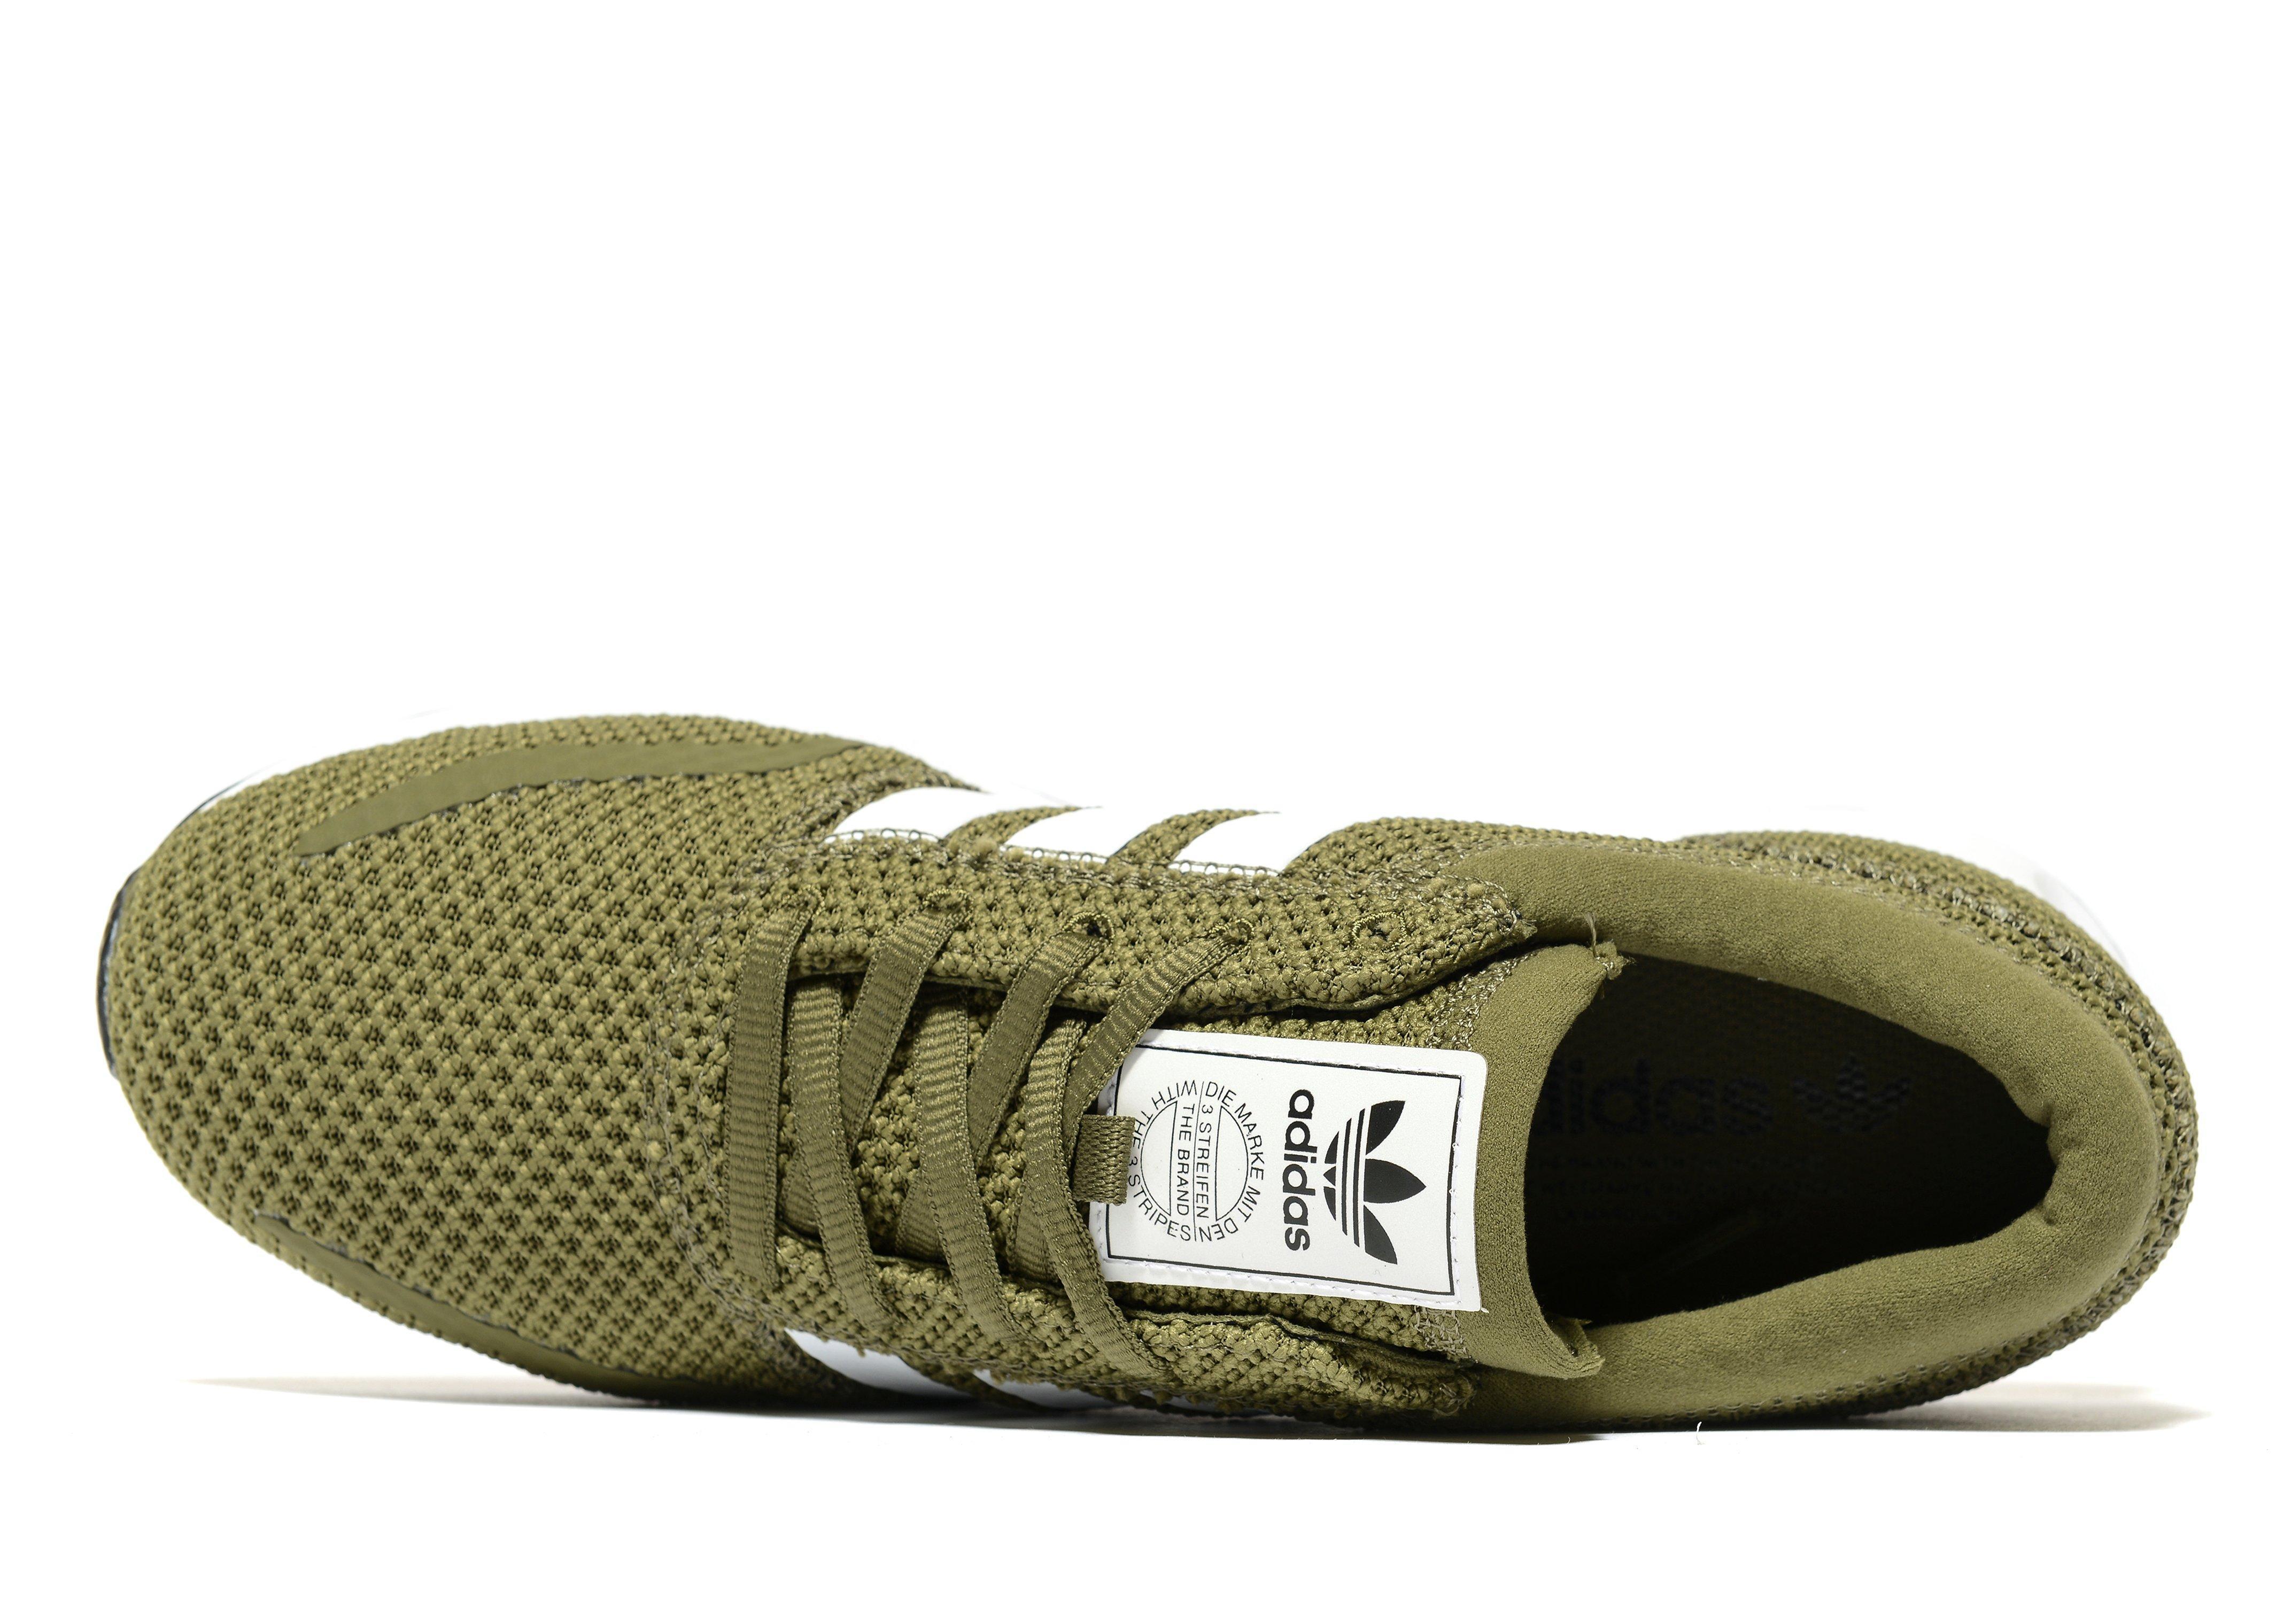 Serafín Radioactivo Ver a través de  adidas Originals Rubber Los Angeles Ck in Olive/White (Green) for Men - Lyst